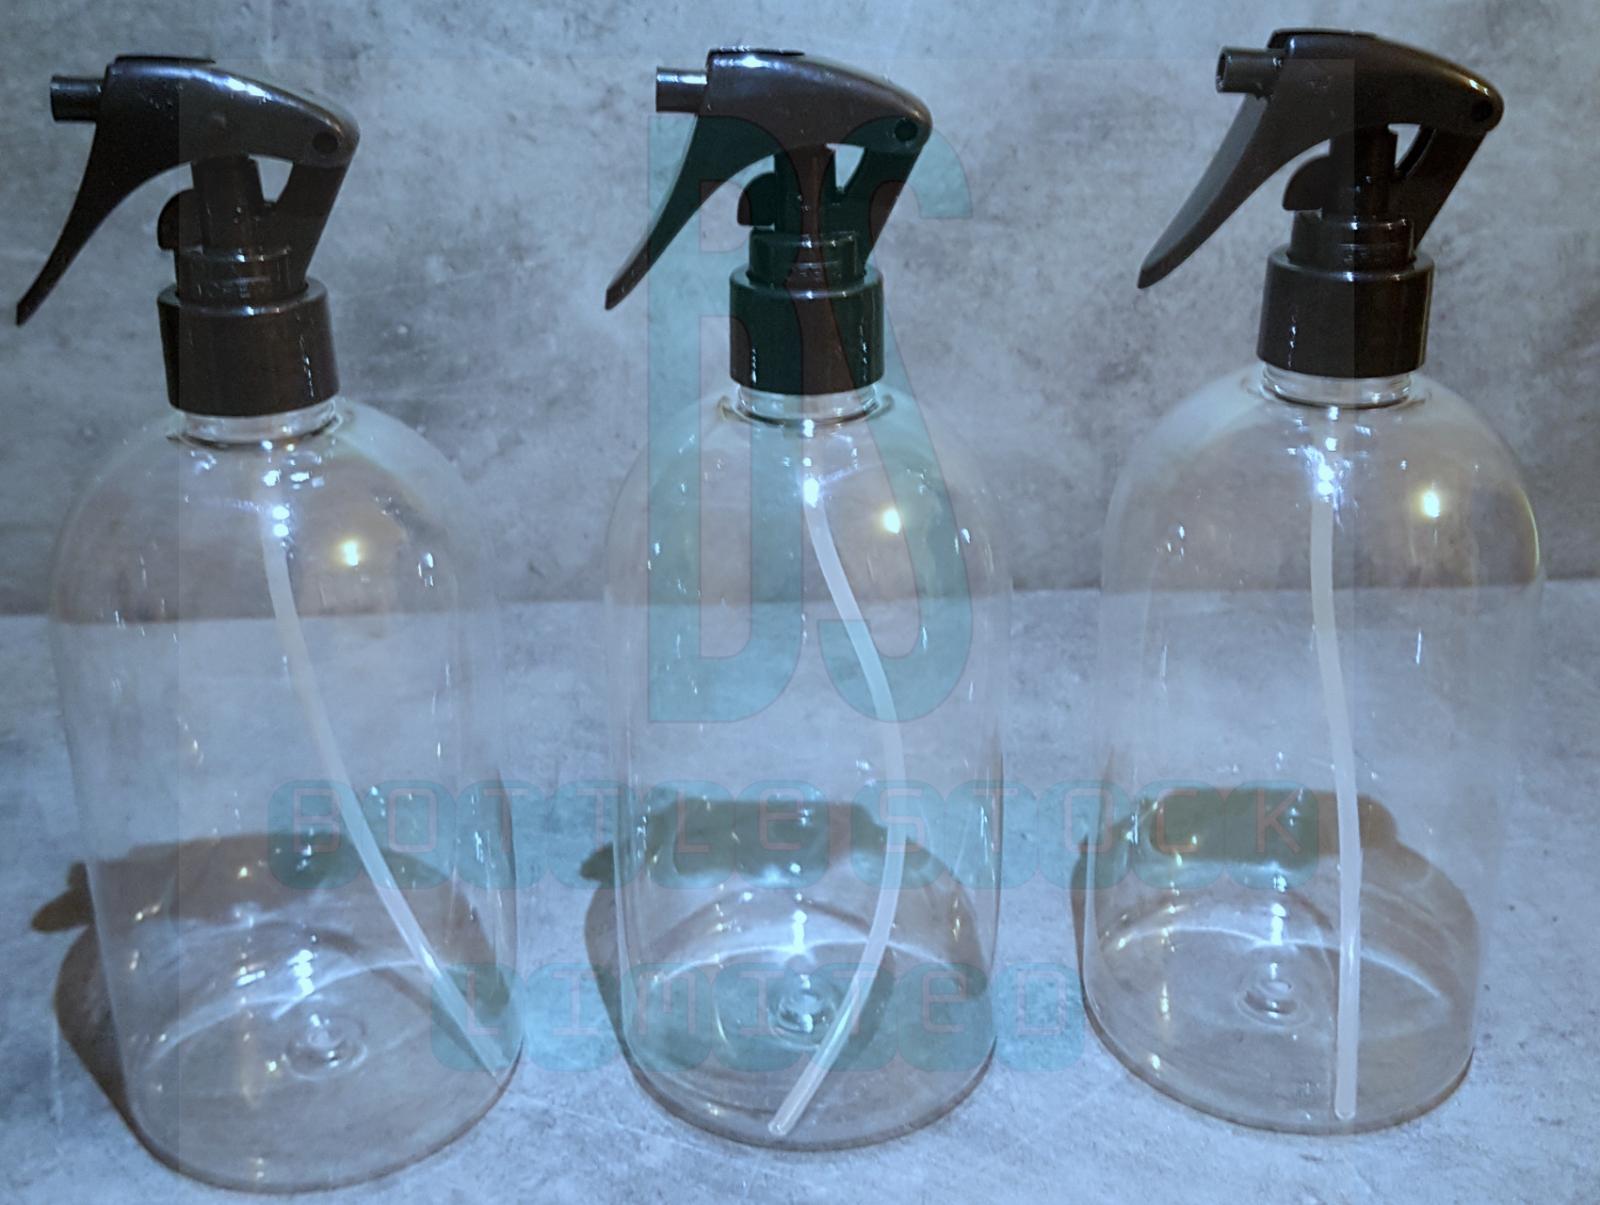 3 x 500ml Empty Plastic Mini Trigger Bottle Cleaning Hand Spray Garden Clear Pet